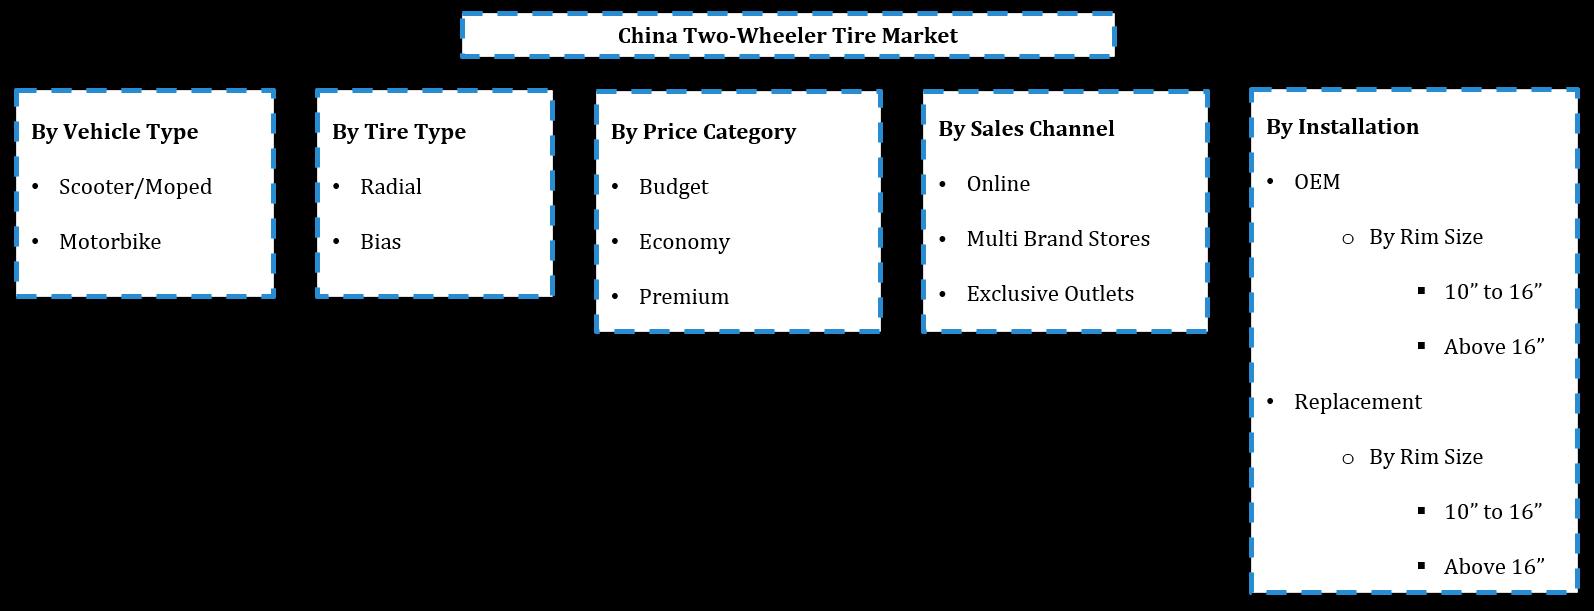 China 2-Wheeler Tire Market Segmentation